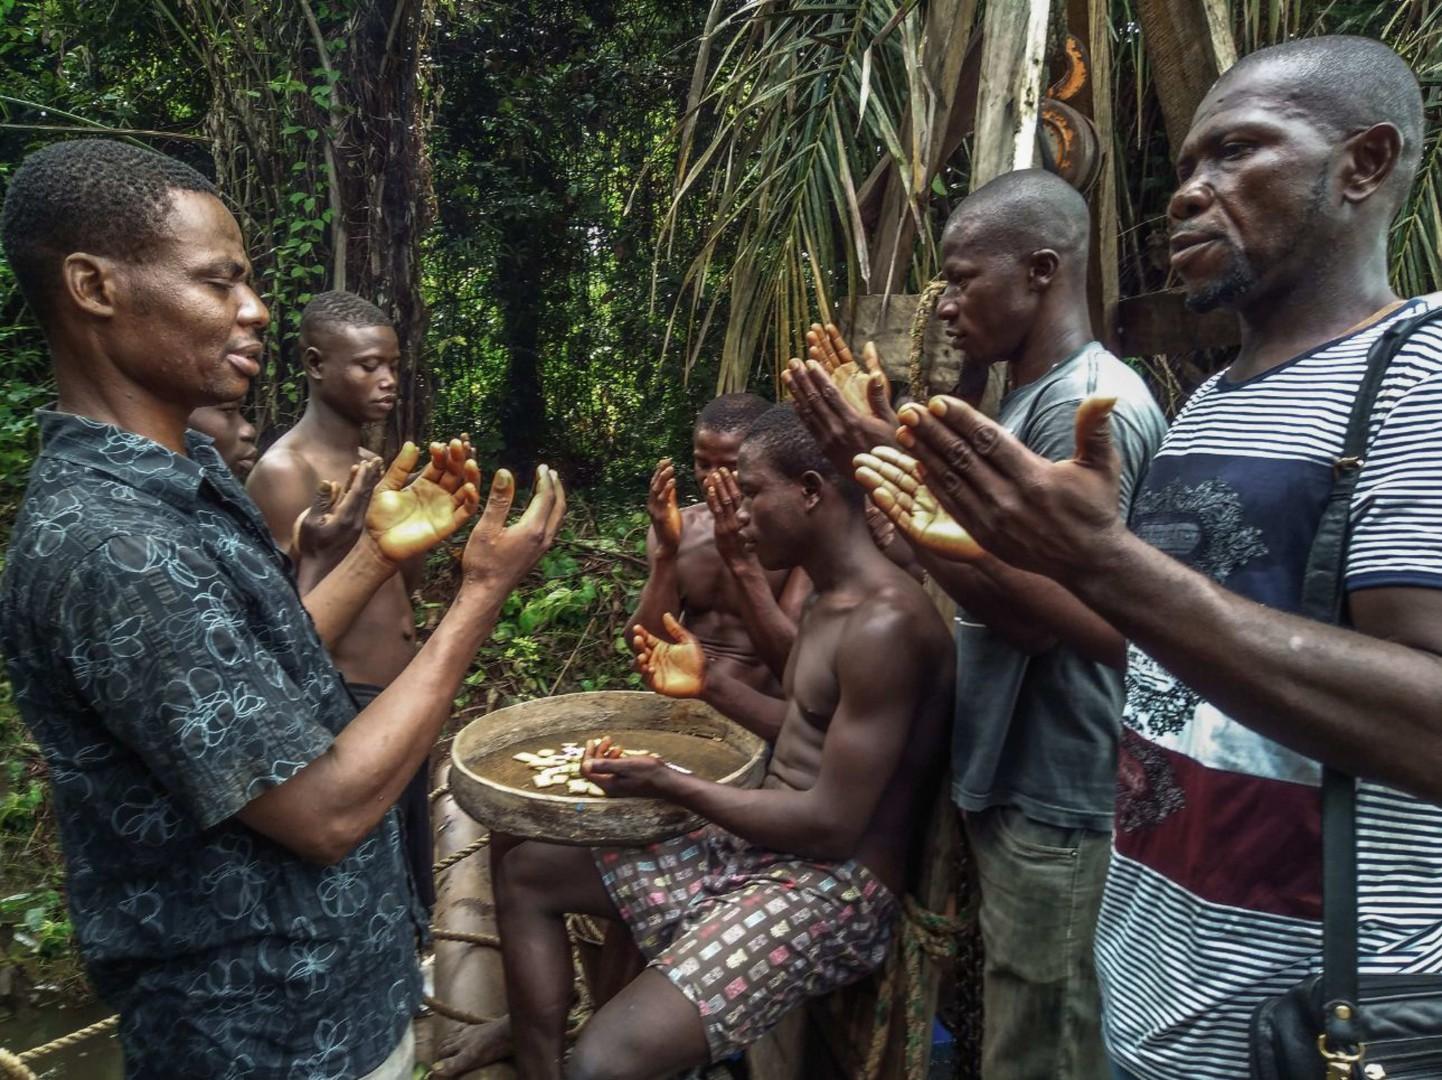 I demoni della Sierra Leone (Foto Jacopo Lentini)